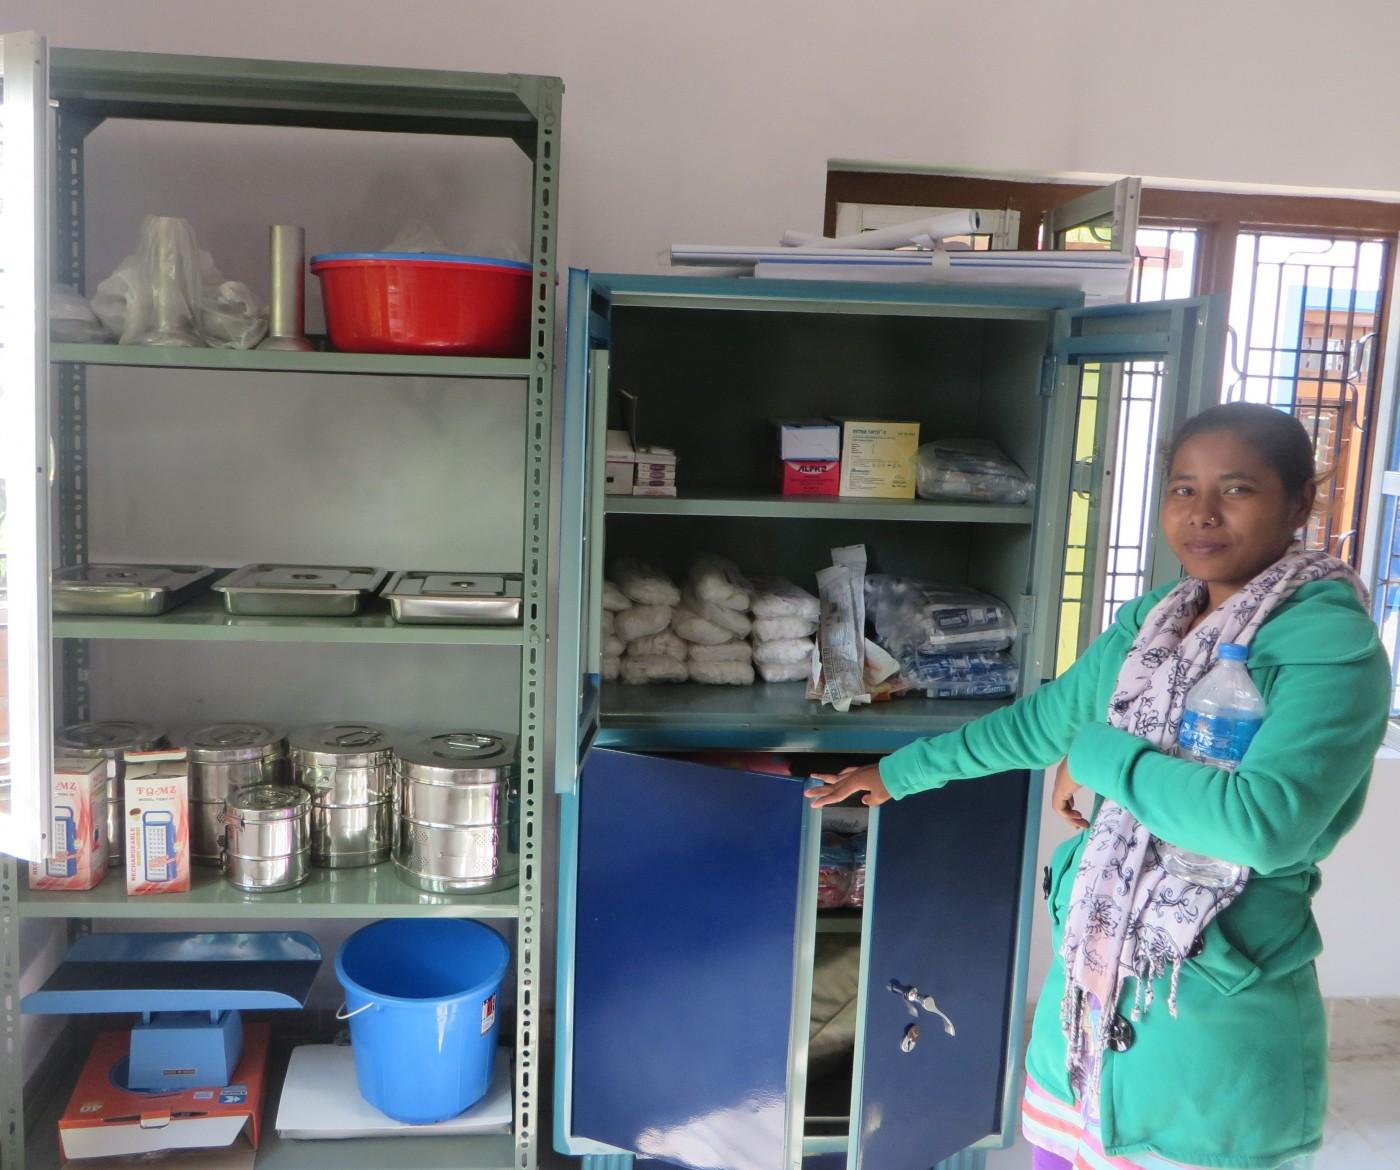 Nepal birthing centre